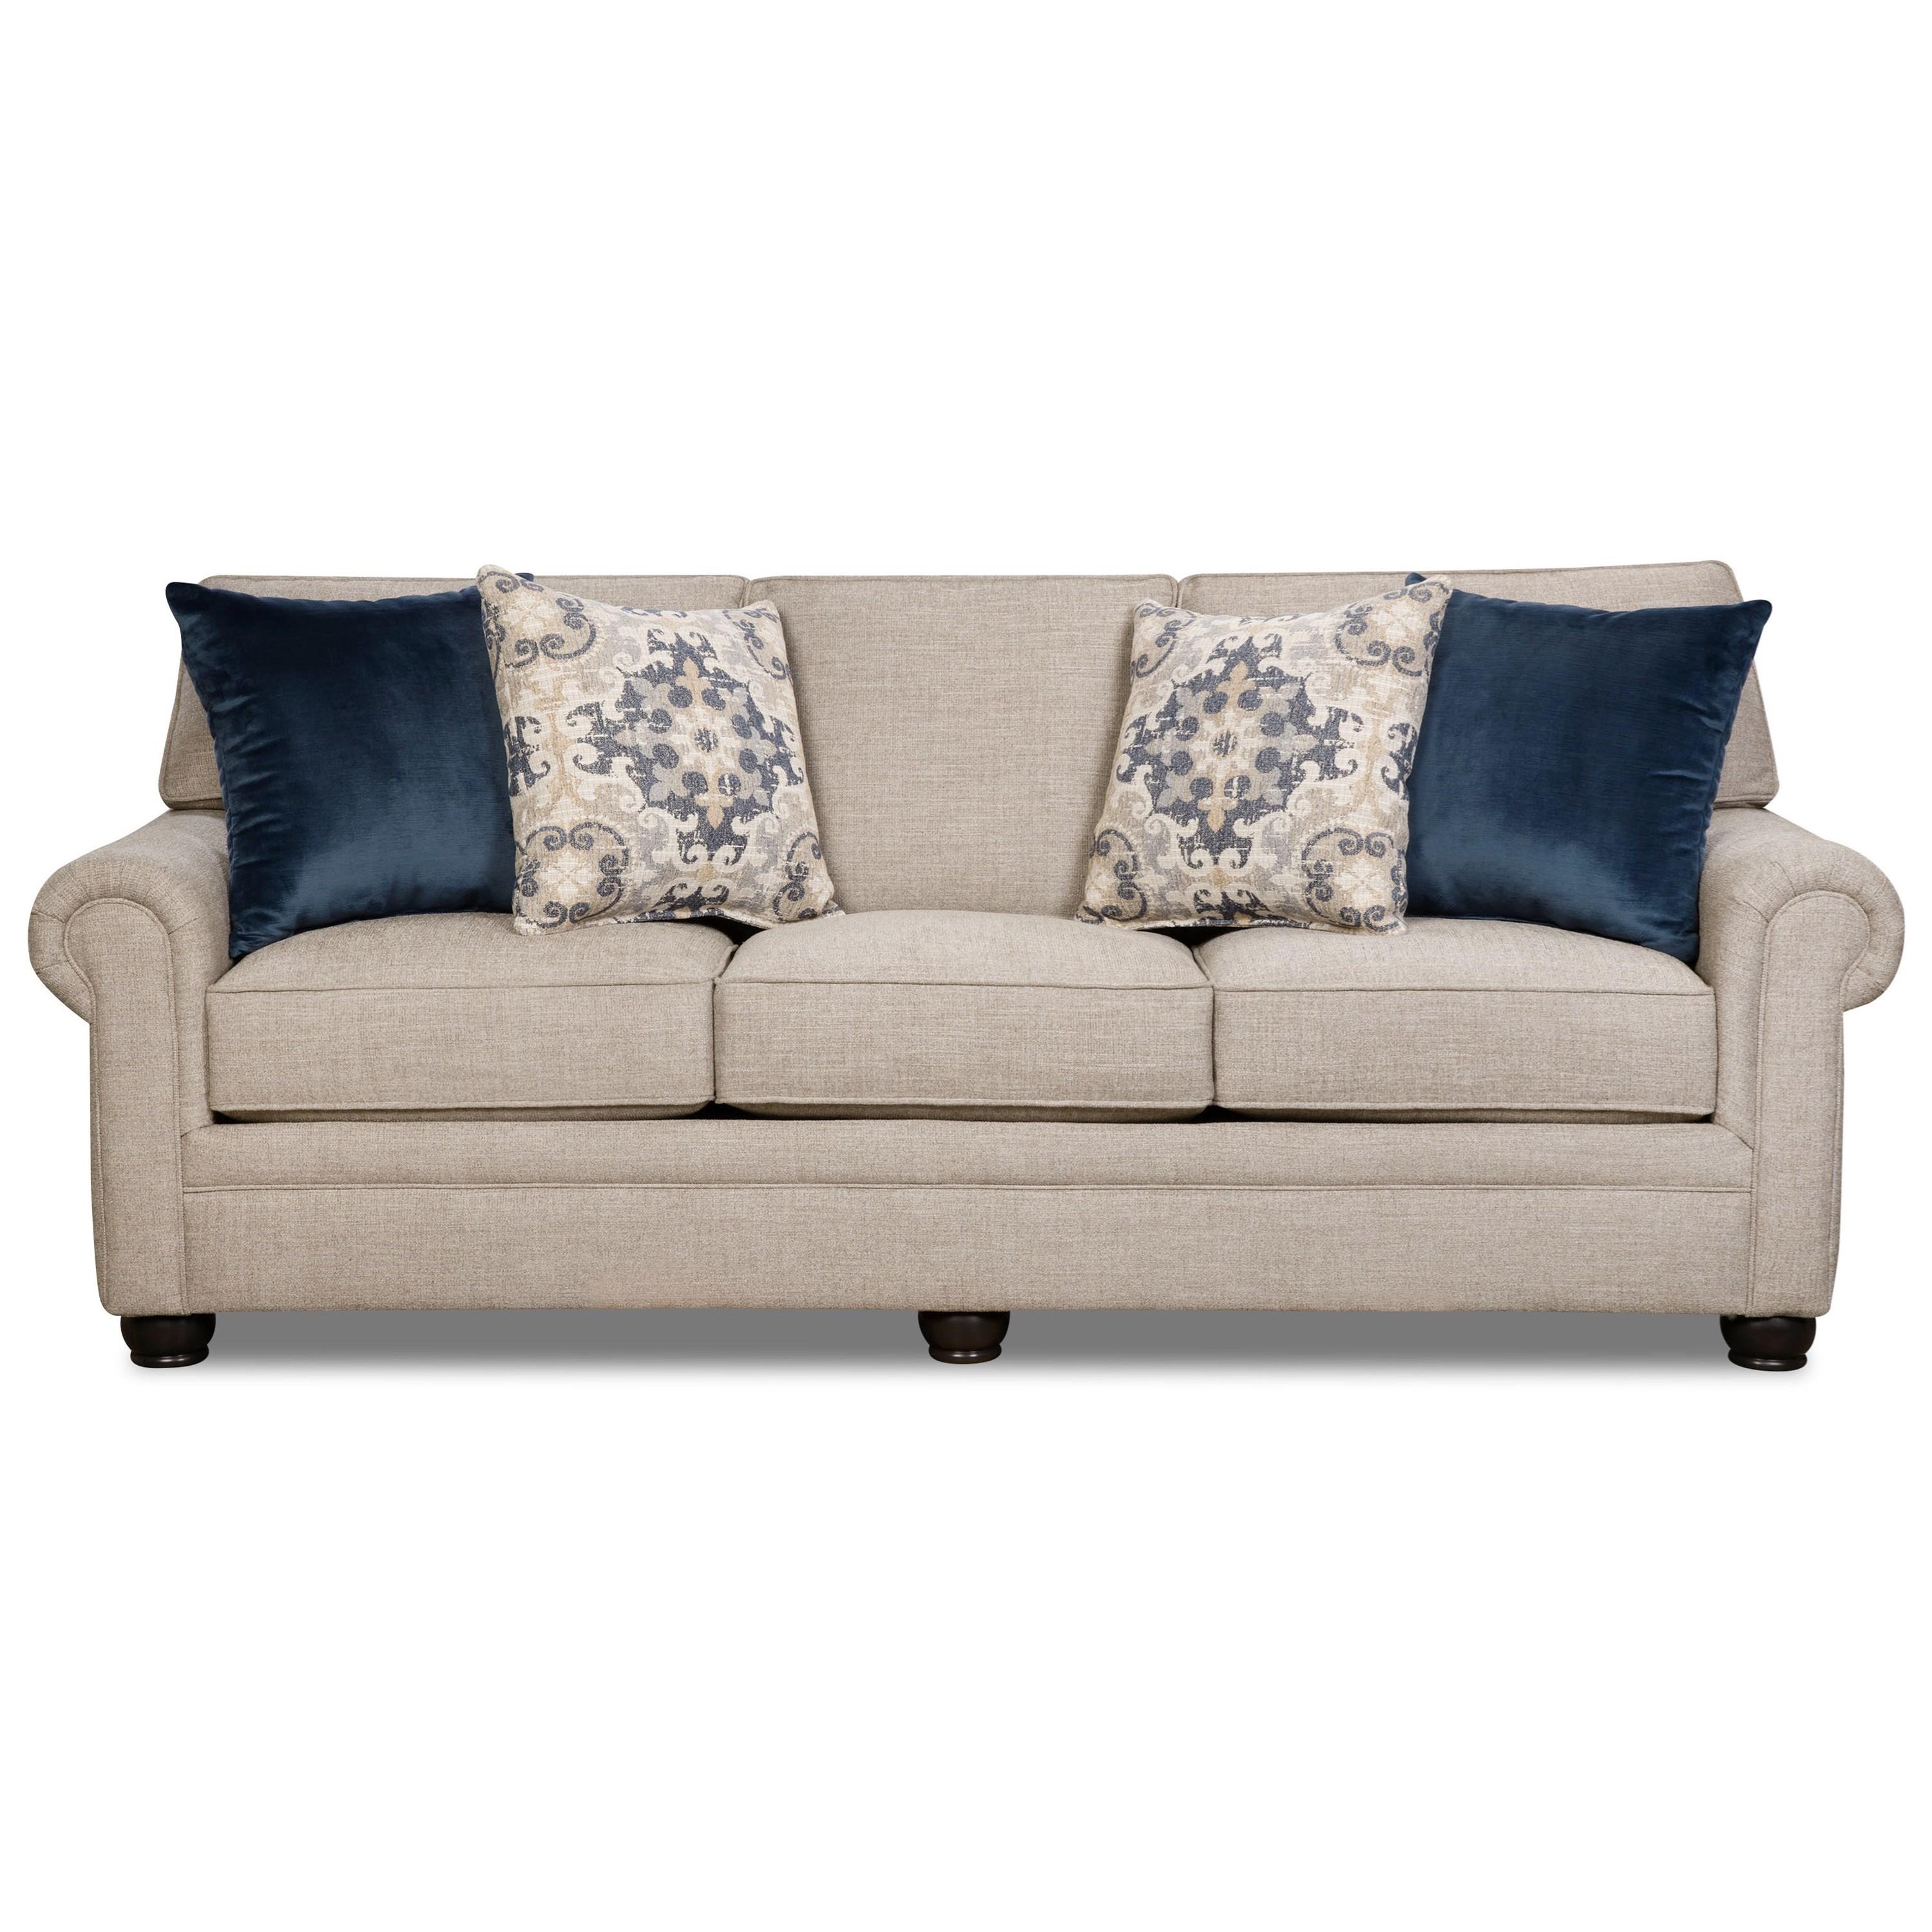 Bennington Sofa by Corinthian at Standard Furniture